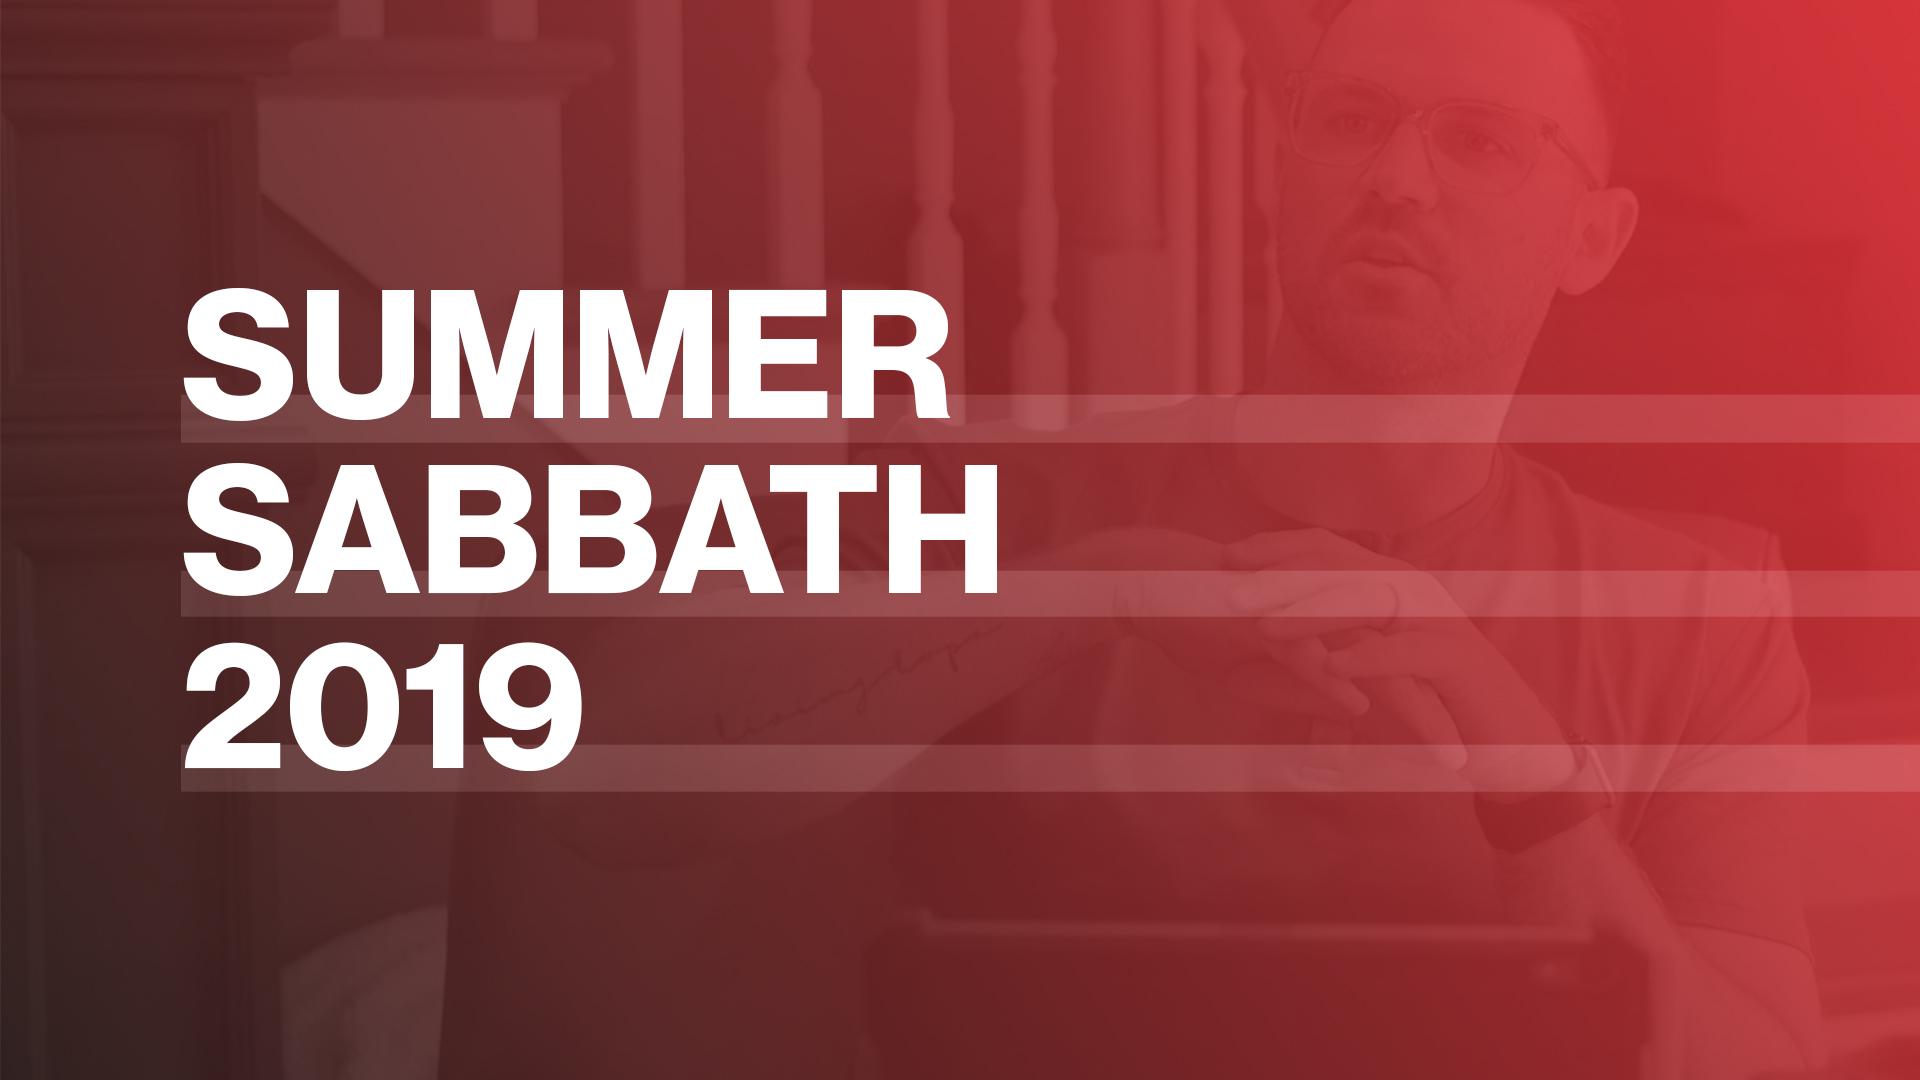 SummerSabbath 2019 Web.jpg